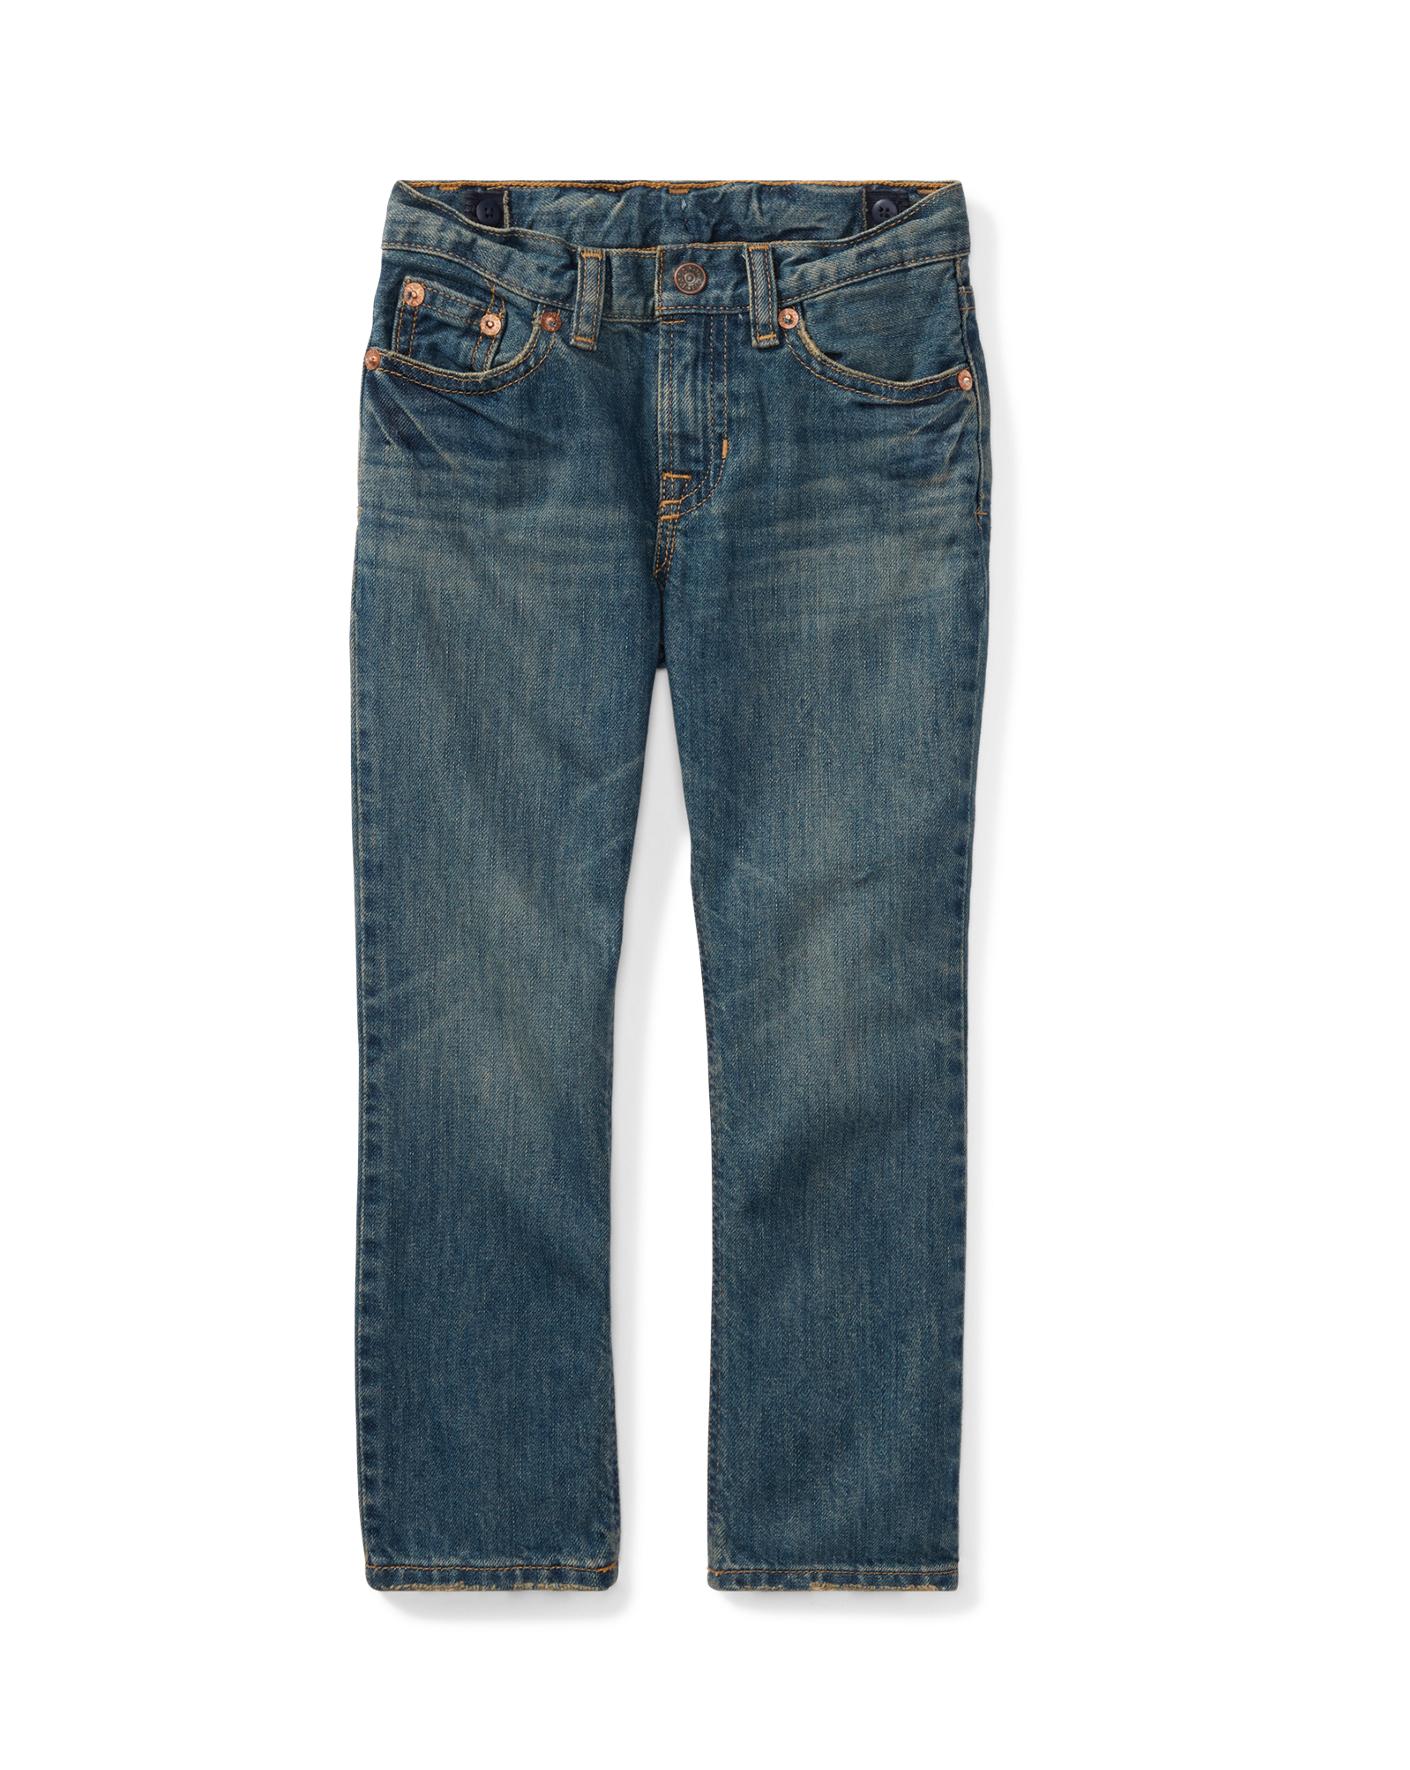 Mott-Wash Slim Jean - Jeans Pants & Jeans - RalphLauren.com